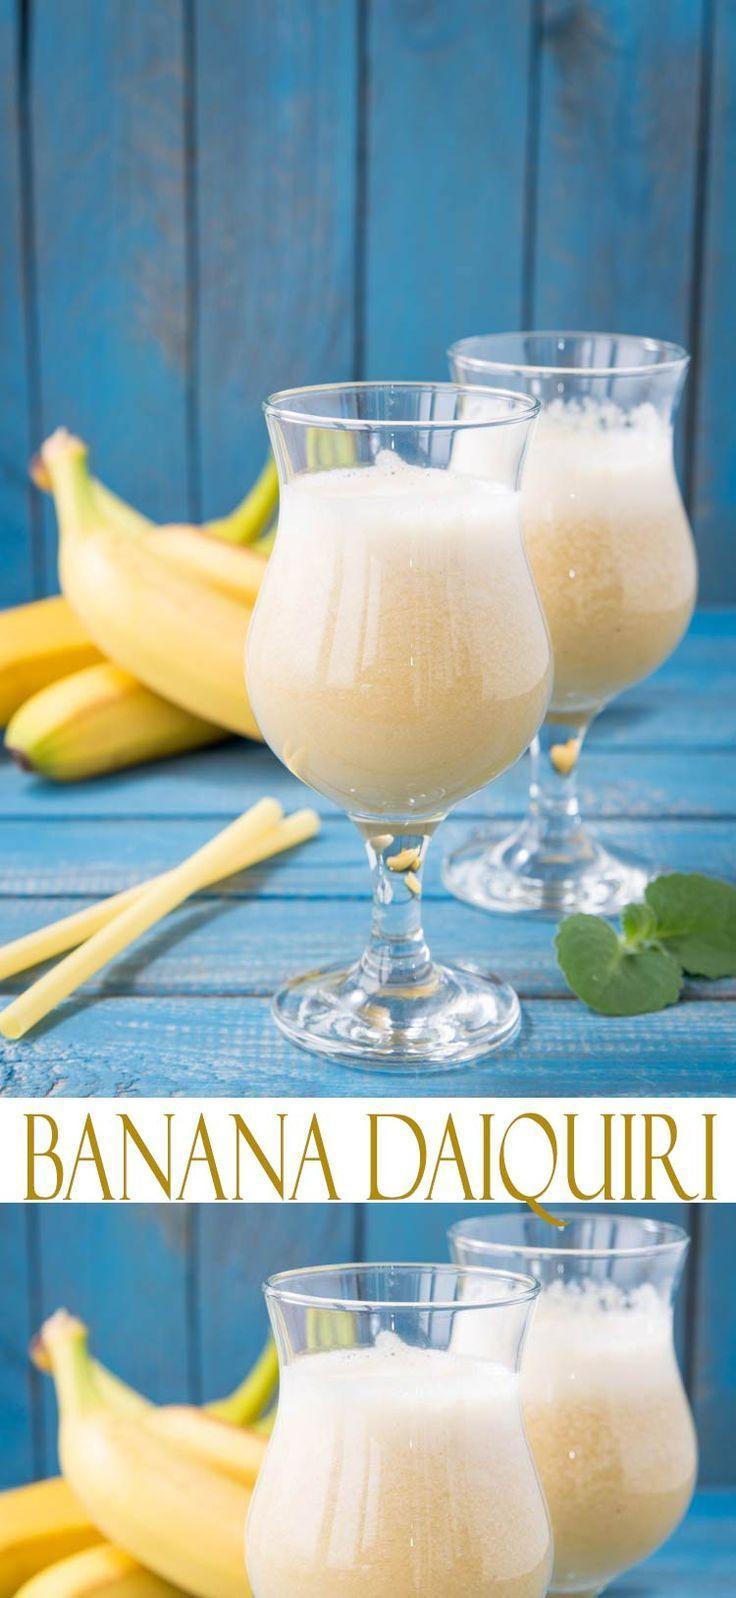 100 tropical drink recipes on pinterest tropical. Black Bedroom Furniture Sets. Home Design Ideas